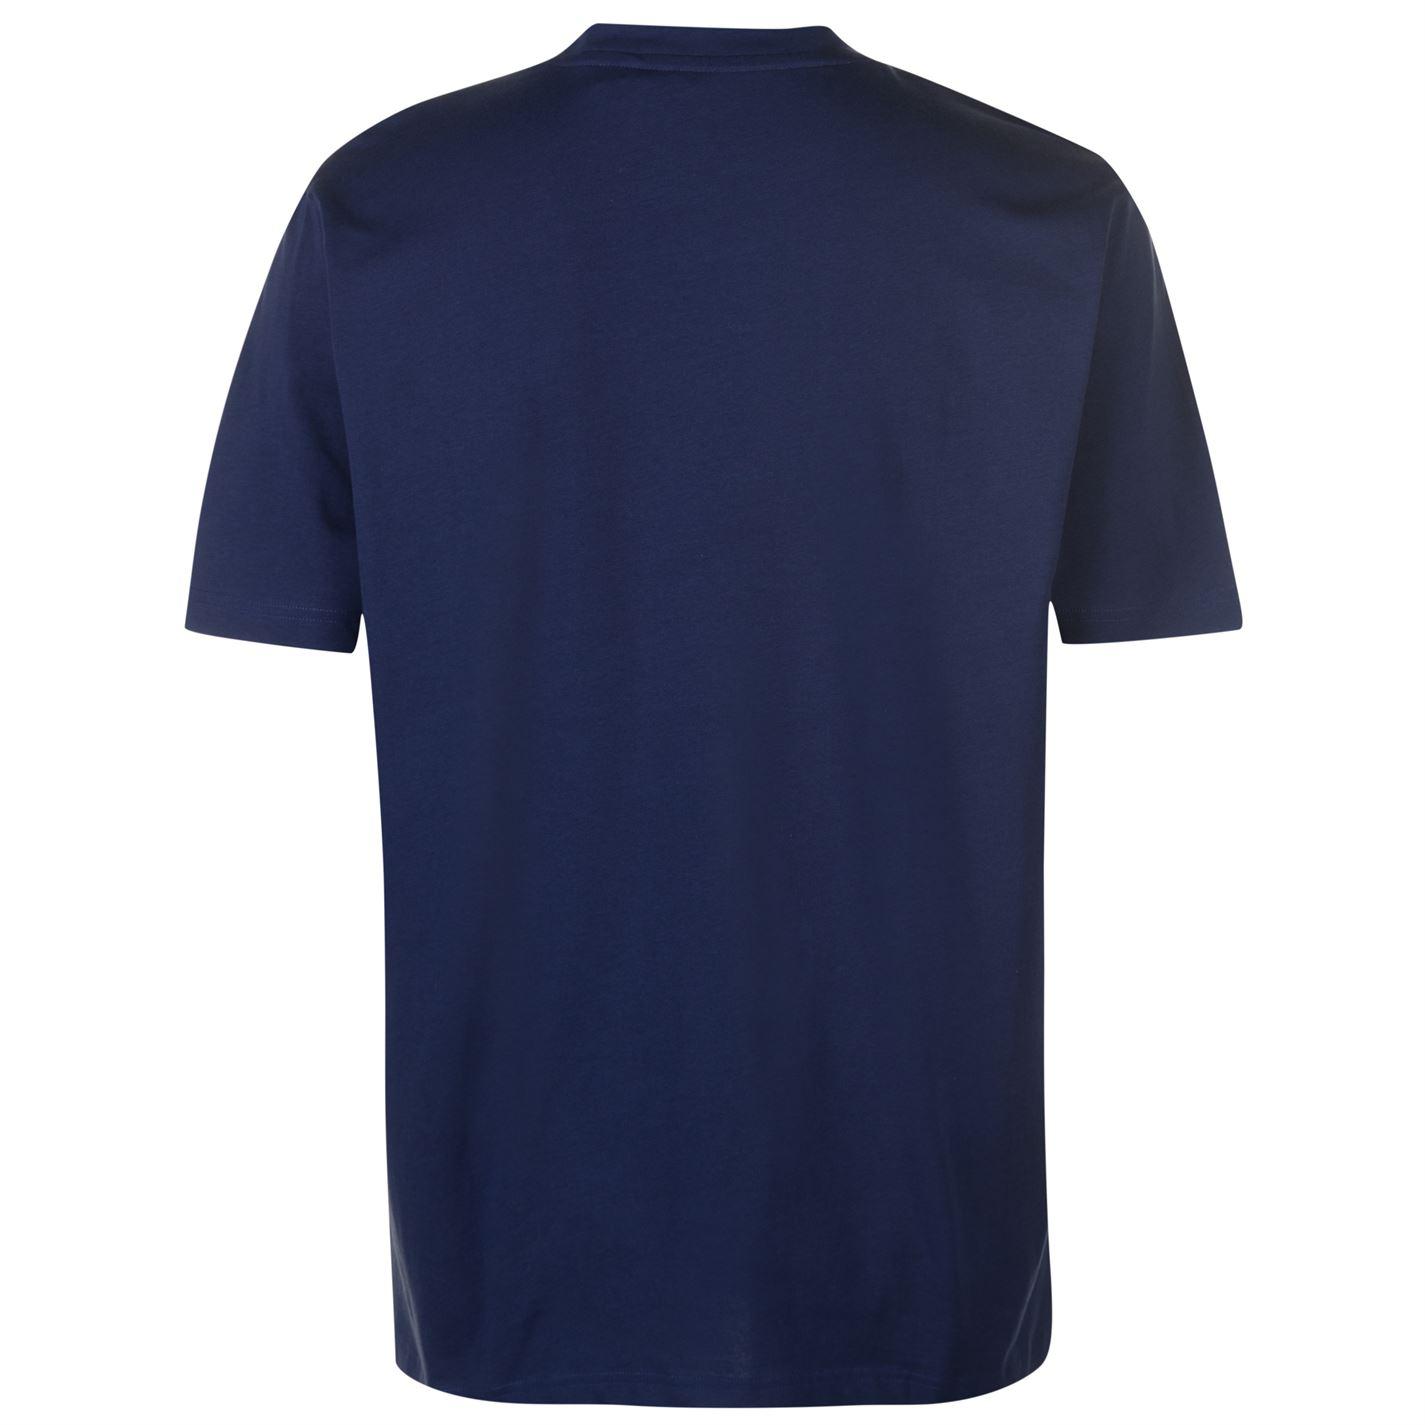 f9942c0a Hot Tuna Mens Fun T Shirt Crew Neck Tee Top Short Sleeve Cotton ...